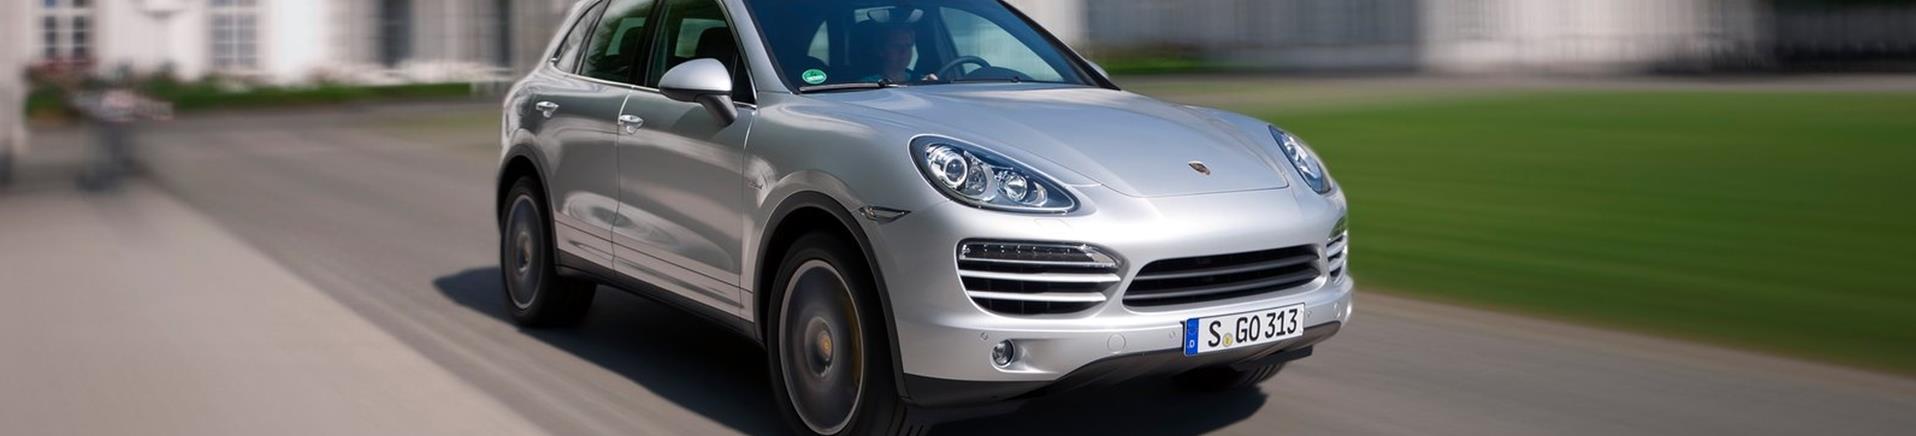 Used Cars Avon MA | Used Cars & Trucks MA | Avon Auto Brokers